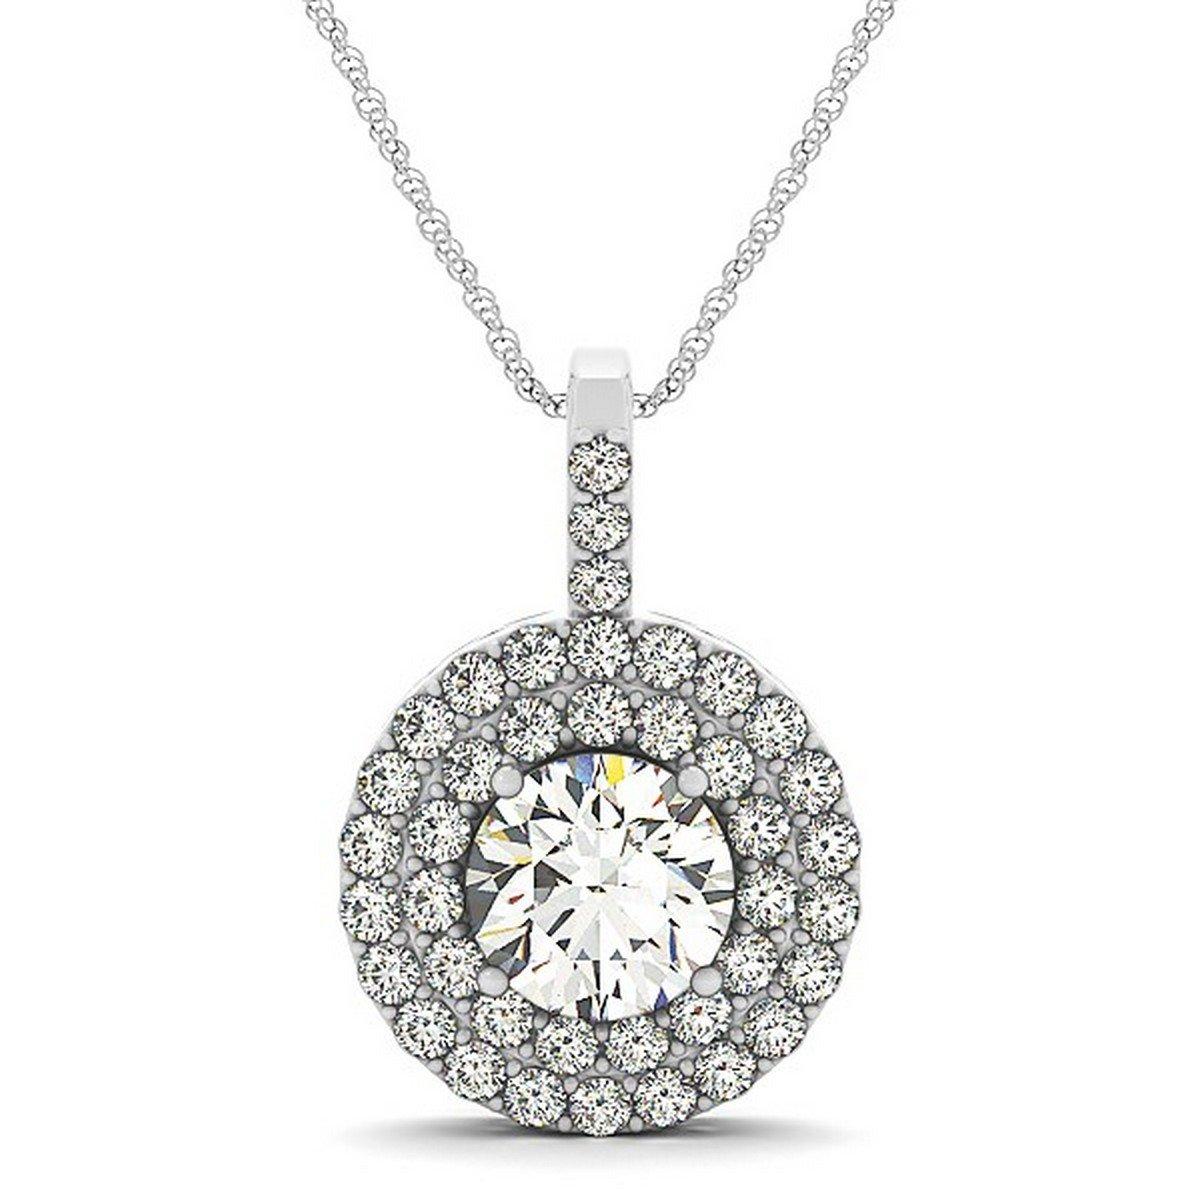 97dfa6e0b6b Amazon.com  Beautiful Women s Diamond Drop Double Halo Pendant Necklace  Striking 14k White Gold (2.25ct)  Jewelry